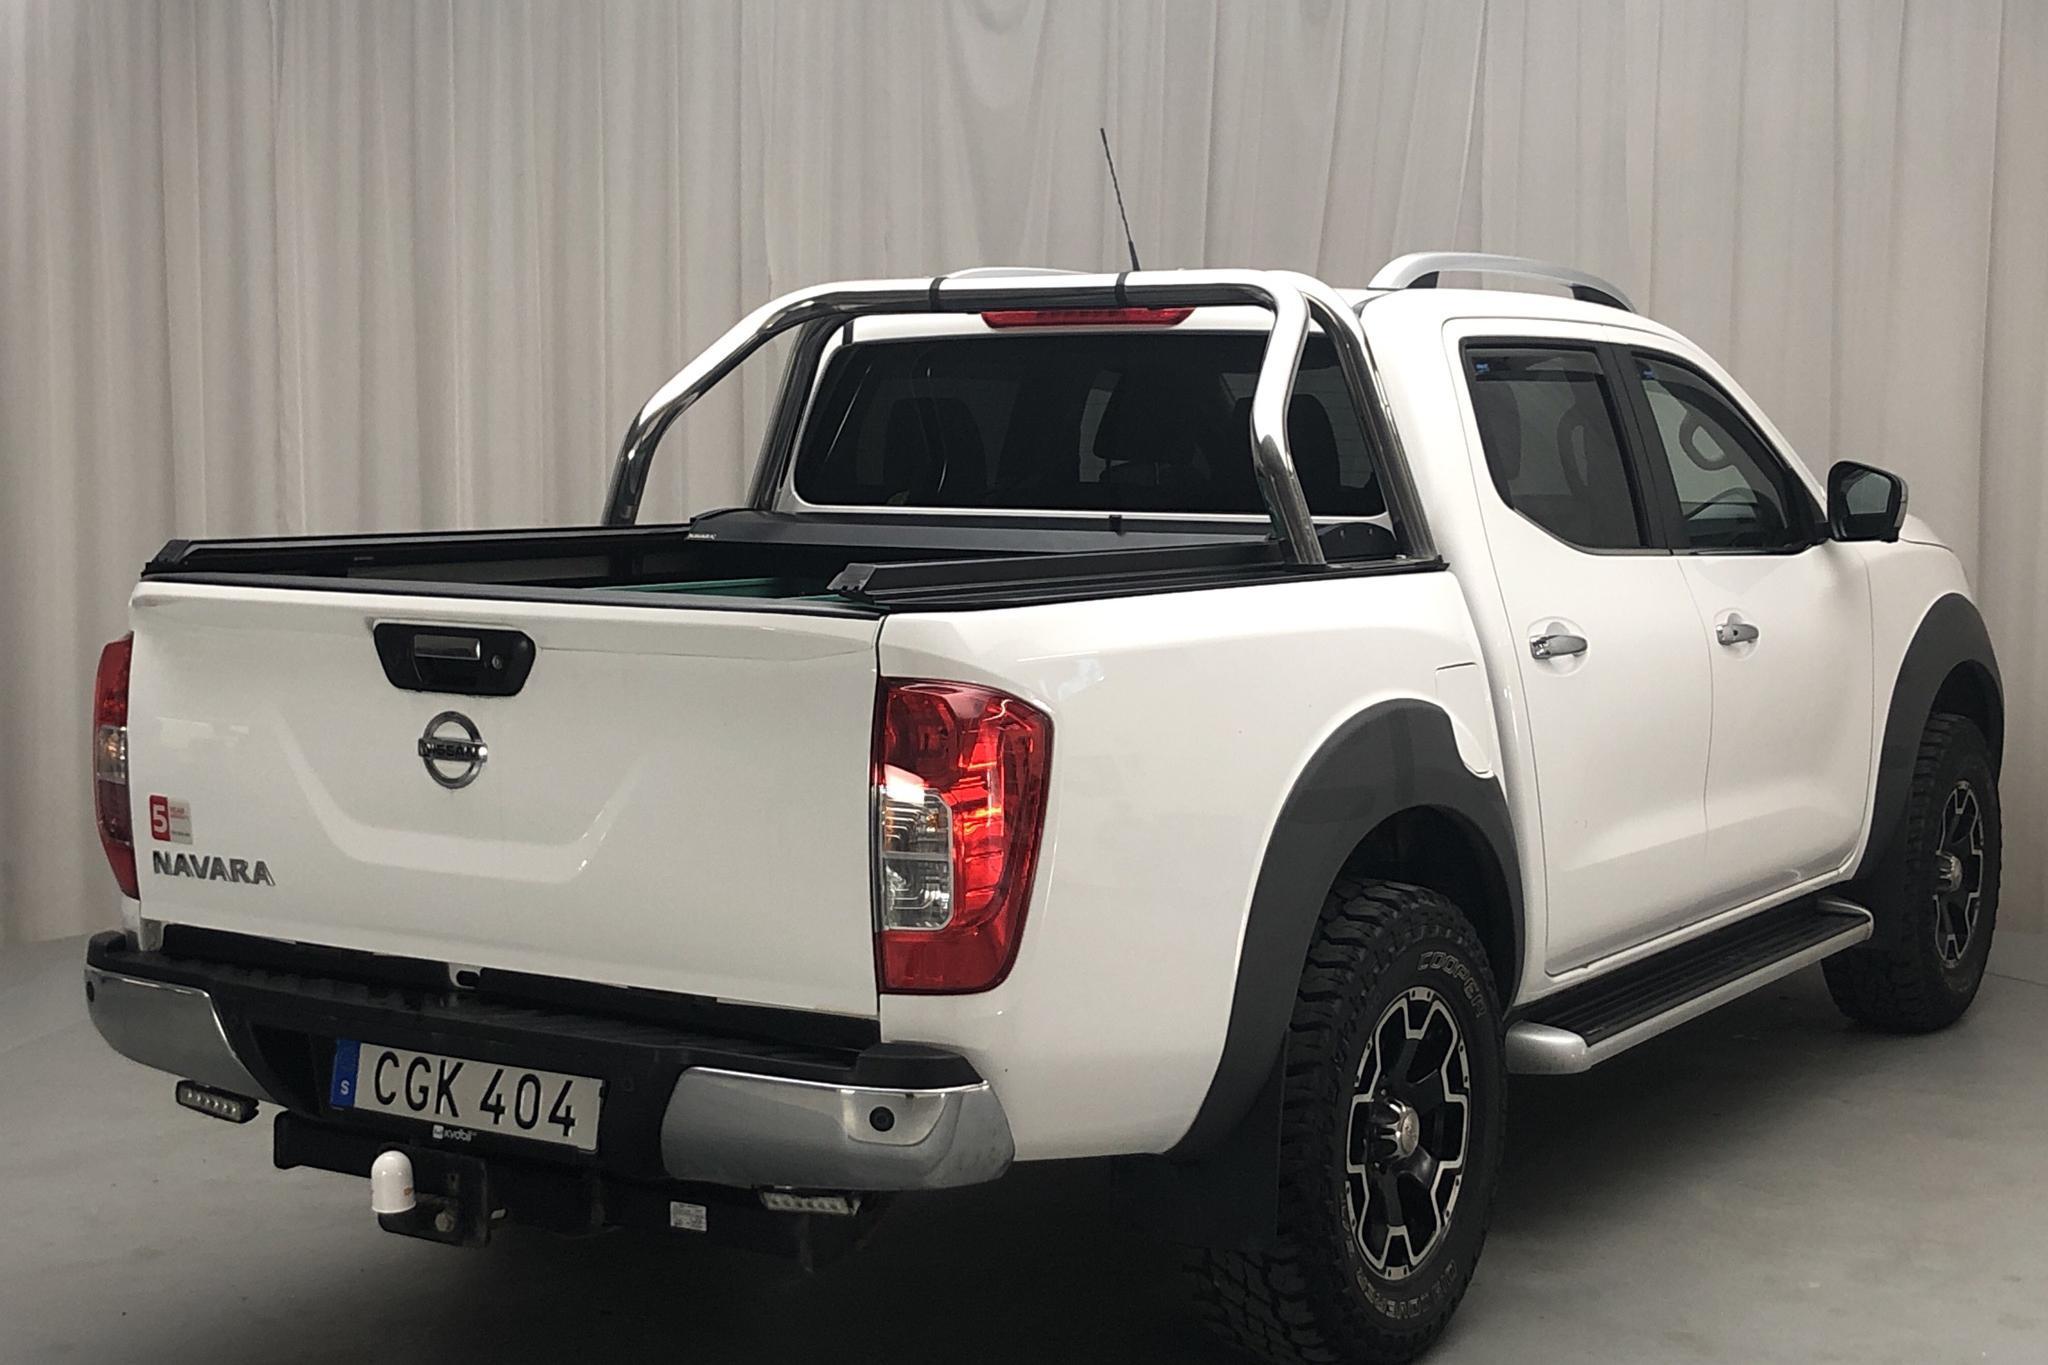 Nissan Navara 2.3 dCi 4x4 (190hk) - 9 320 mil - Automat - vit - 2018